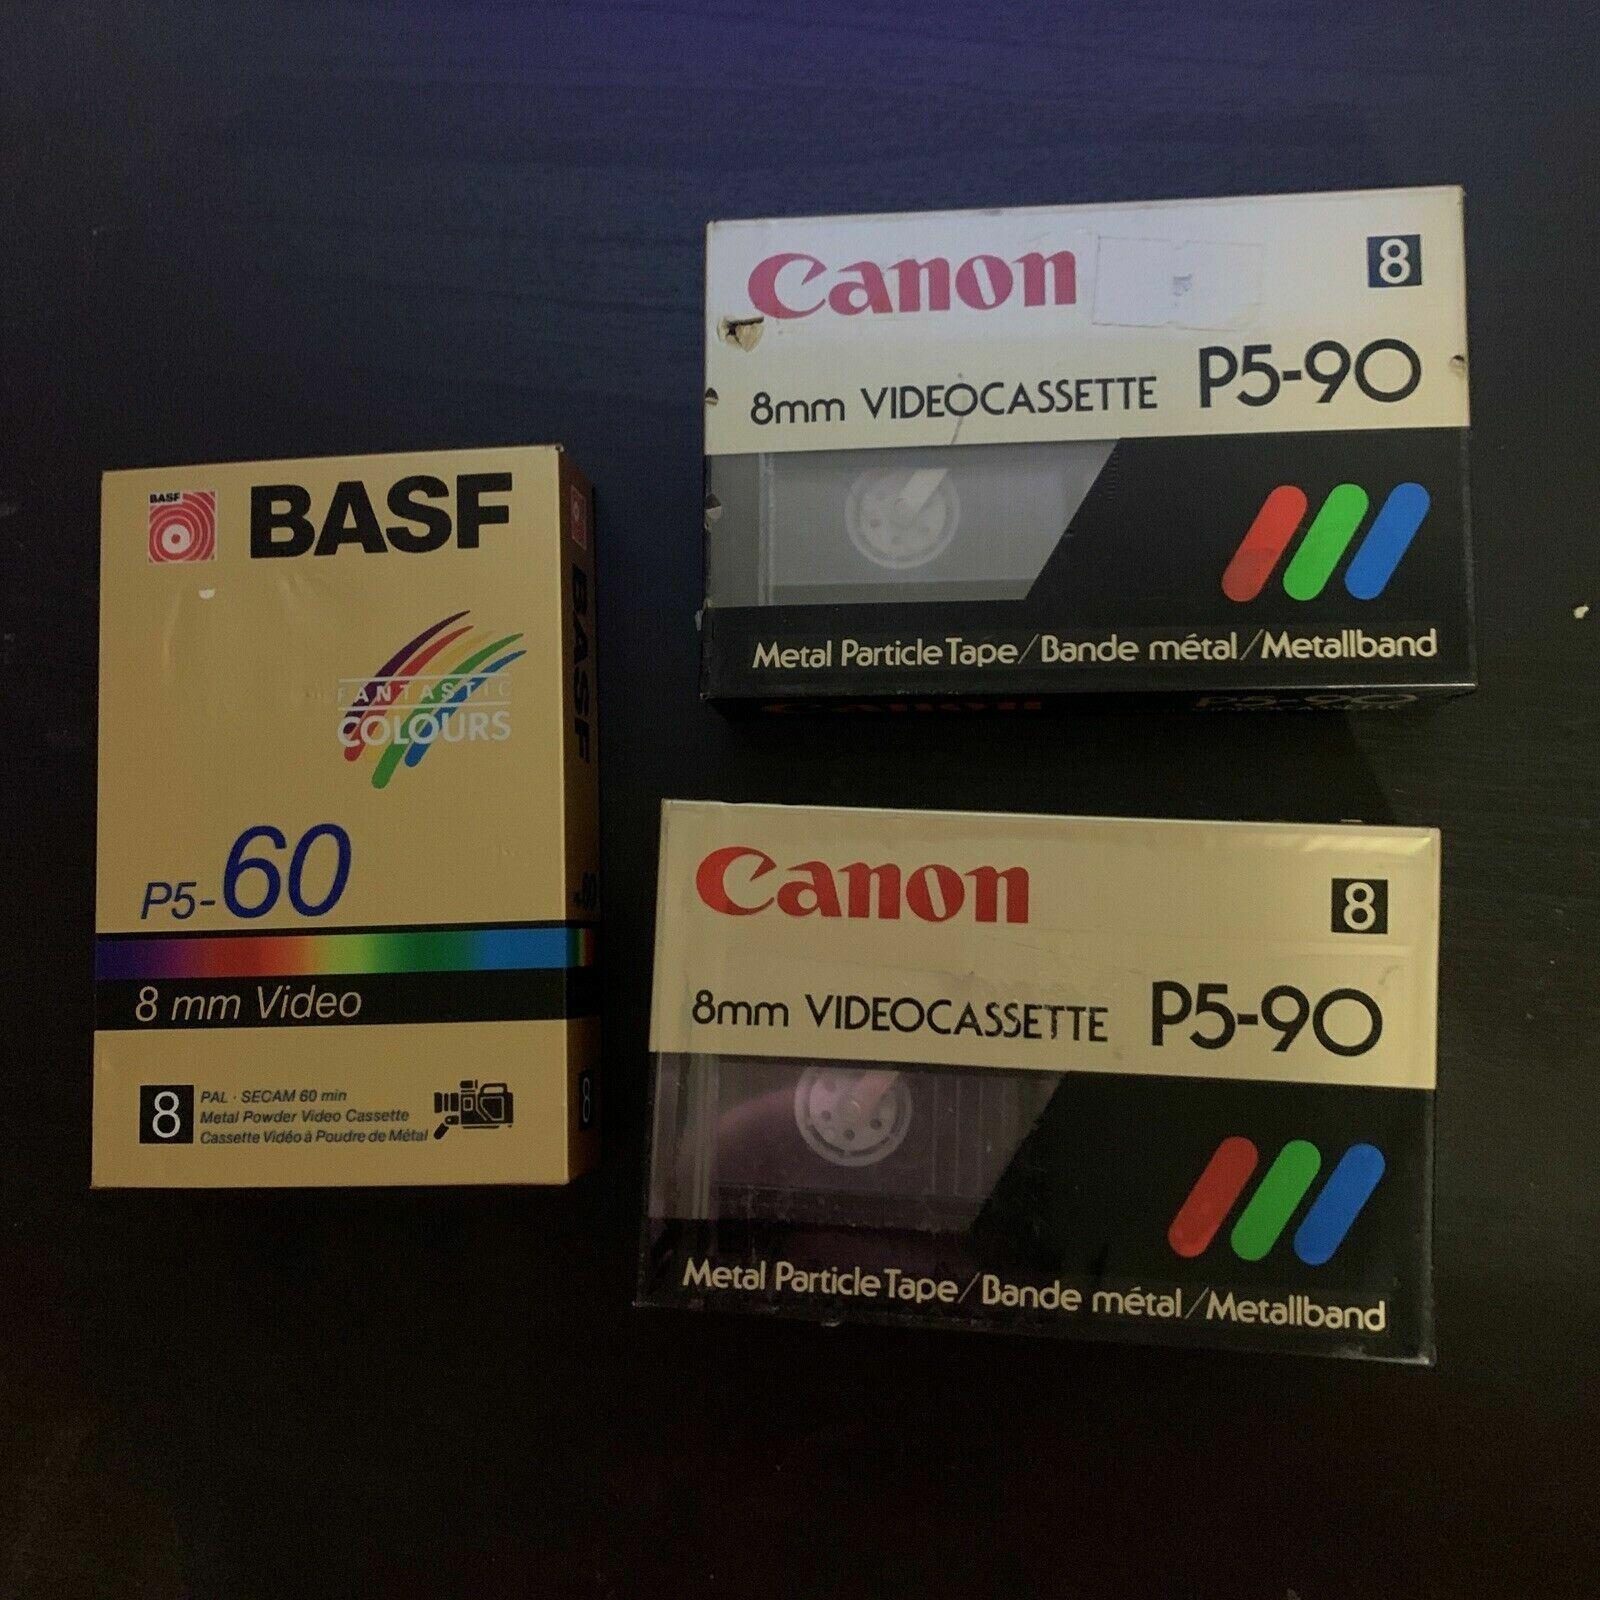 *New Sealed* 2x Canon P5-90 & 1x BASF P5-60 8mm Video Cassette PAL